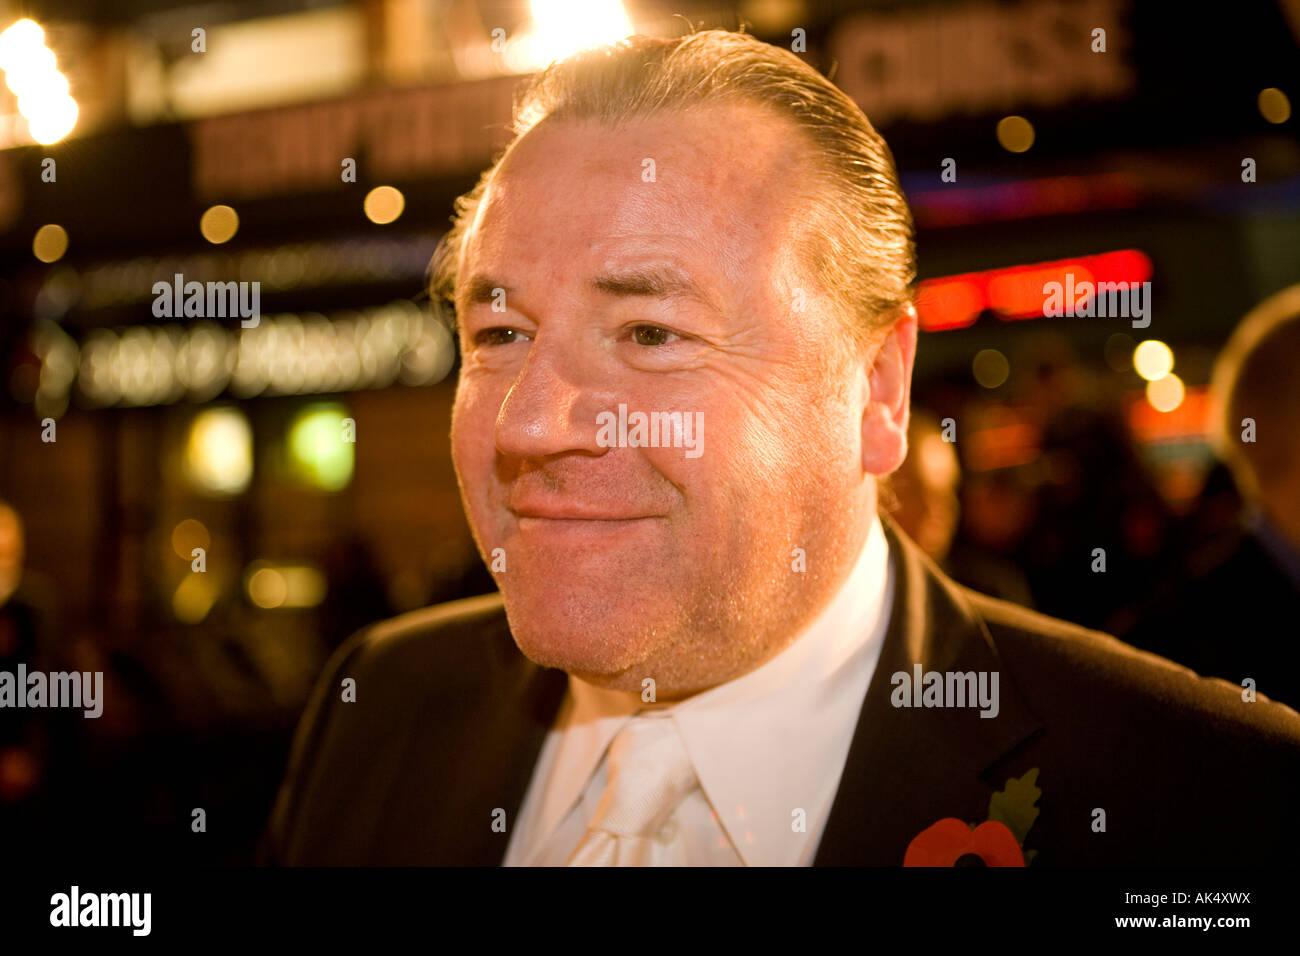 Beo Wulf - europäischer Film Premiere London Leicester Sqaure Darsteller Ray winstone Stockbild